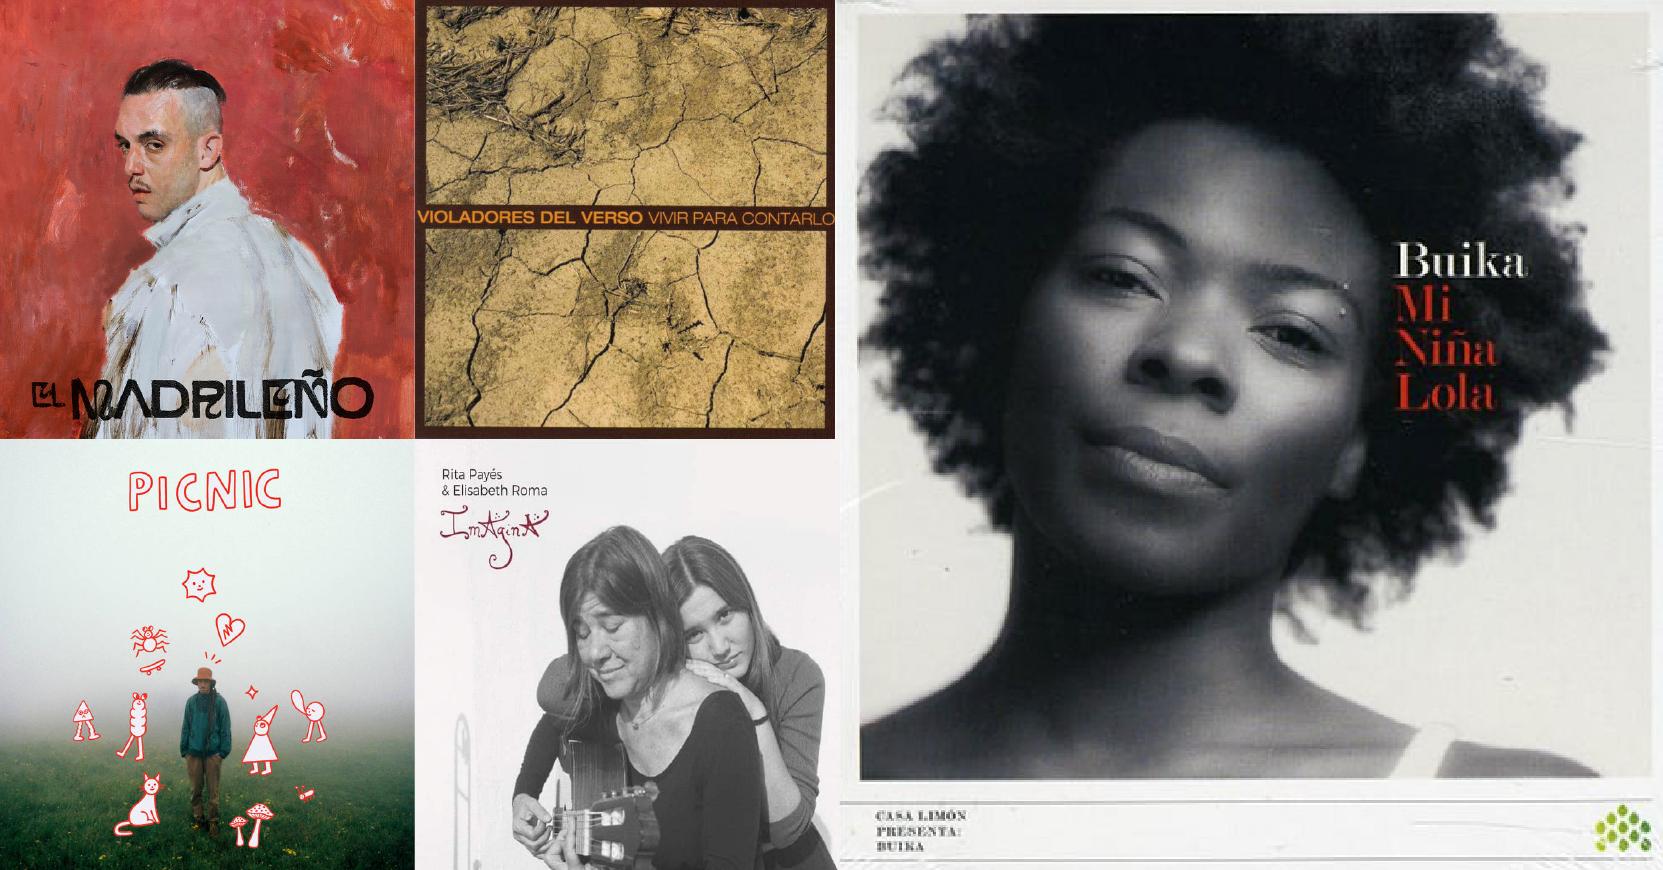 albums of bands C. Tangana, Fanso, Violadores Del Verso, Buika, and Rita Payés